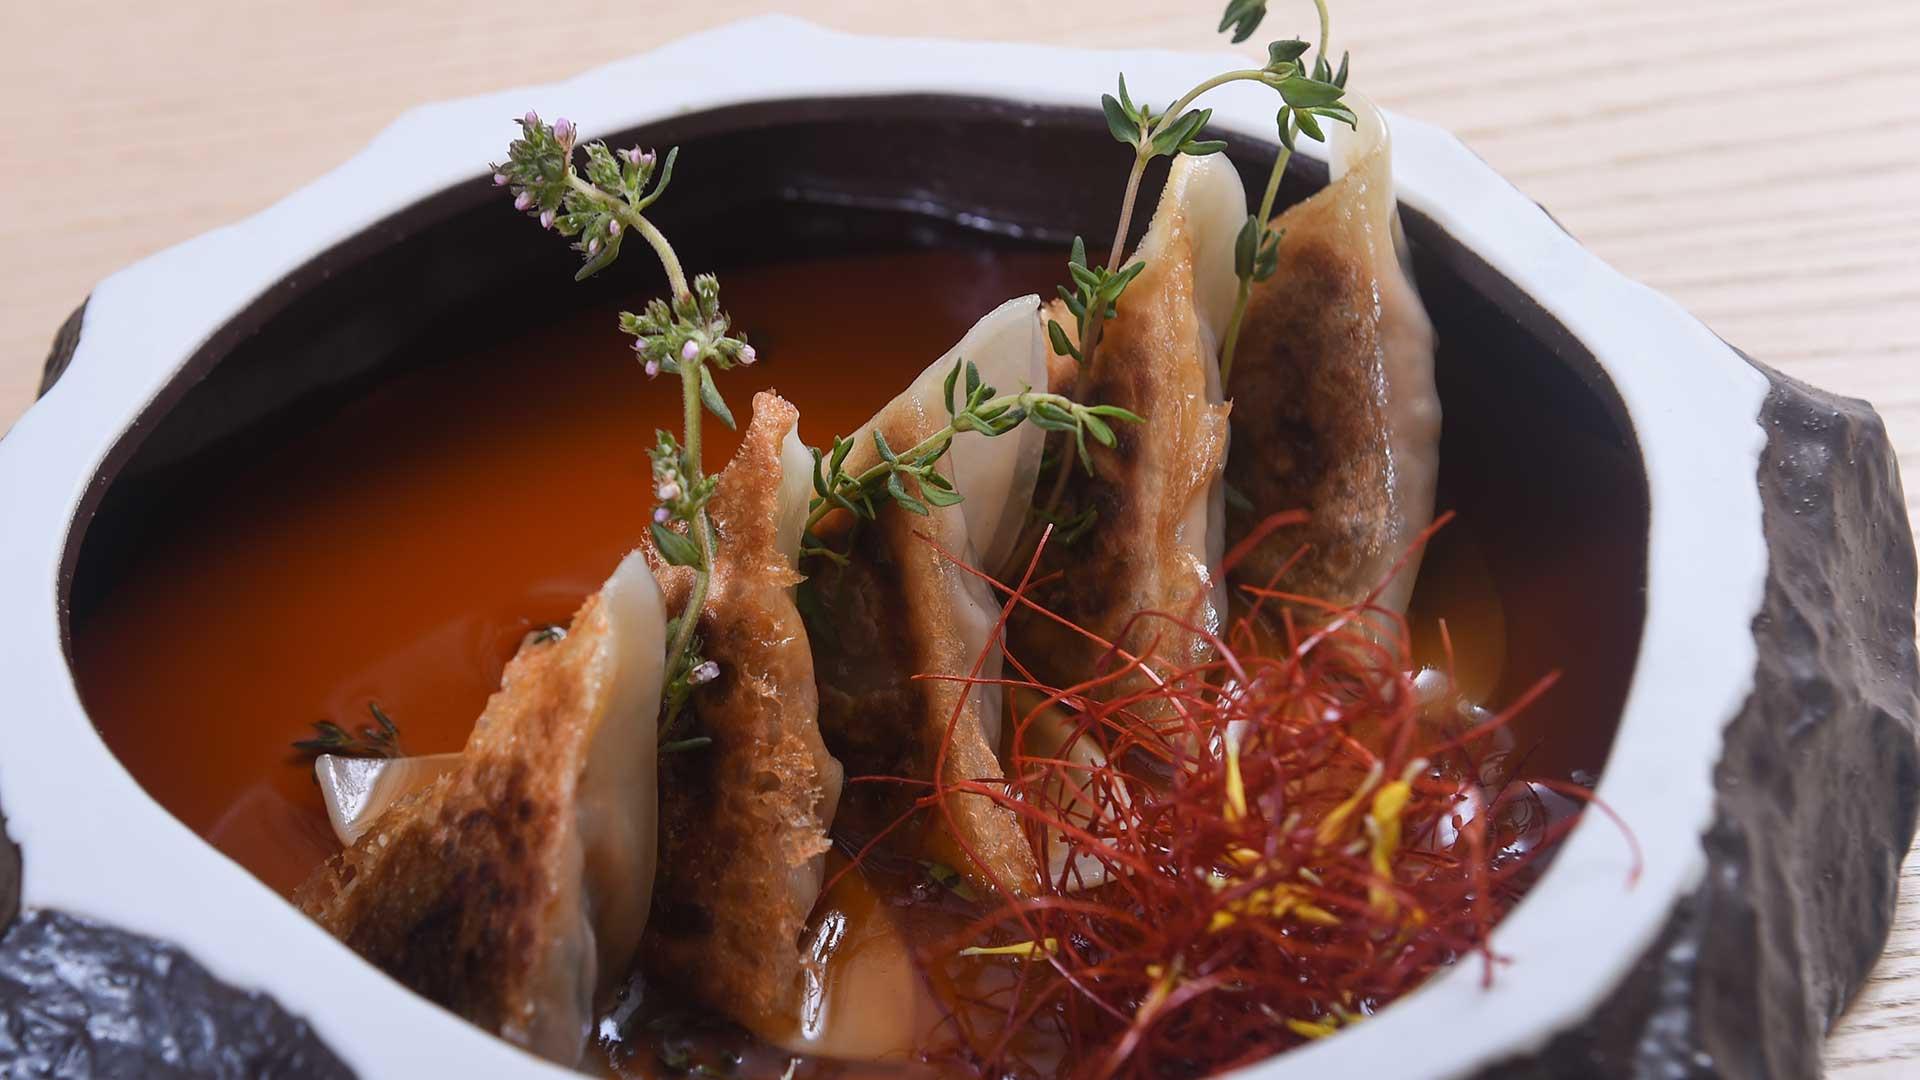 Japanese wagyu-beef dumplings from Ginza Onodera